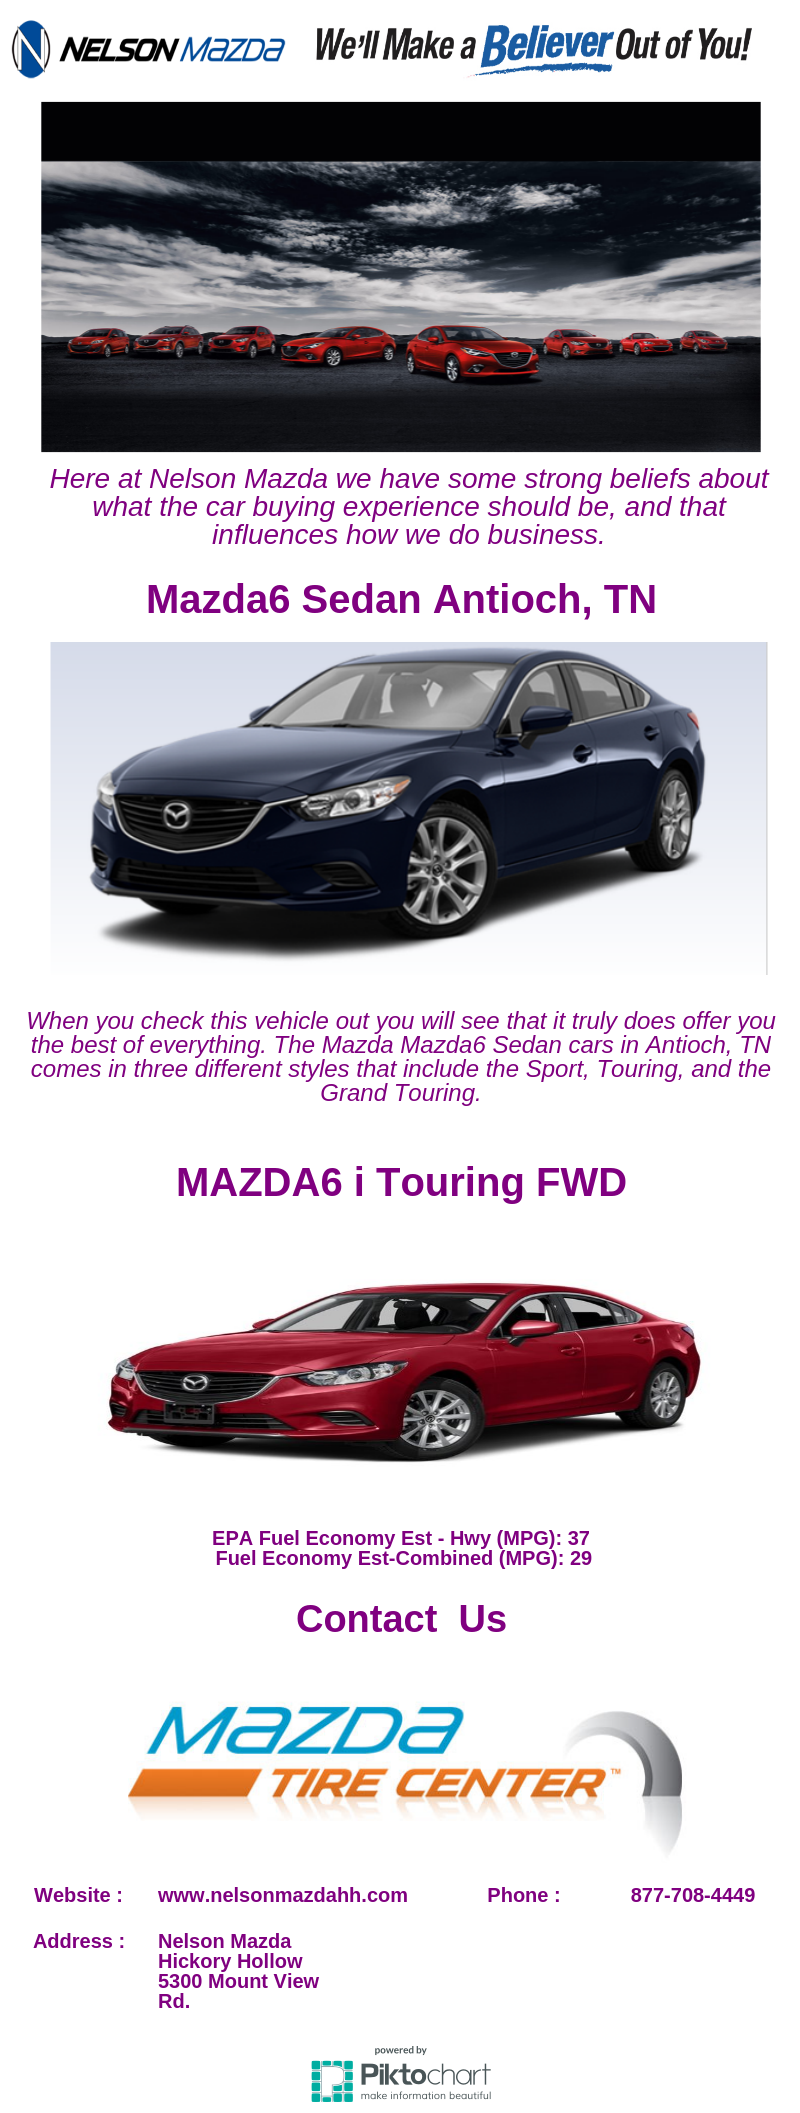 Mazda Dealer In Antioch Tn Nelson Mazda Thinglink